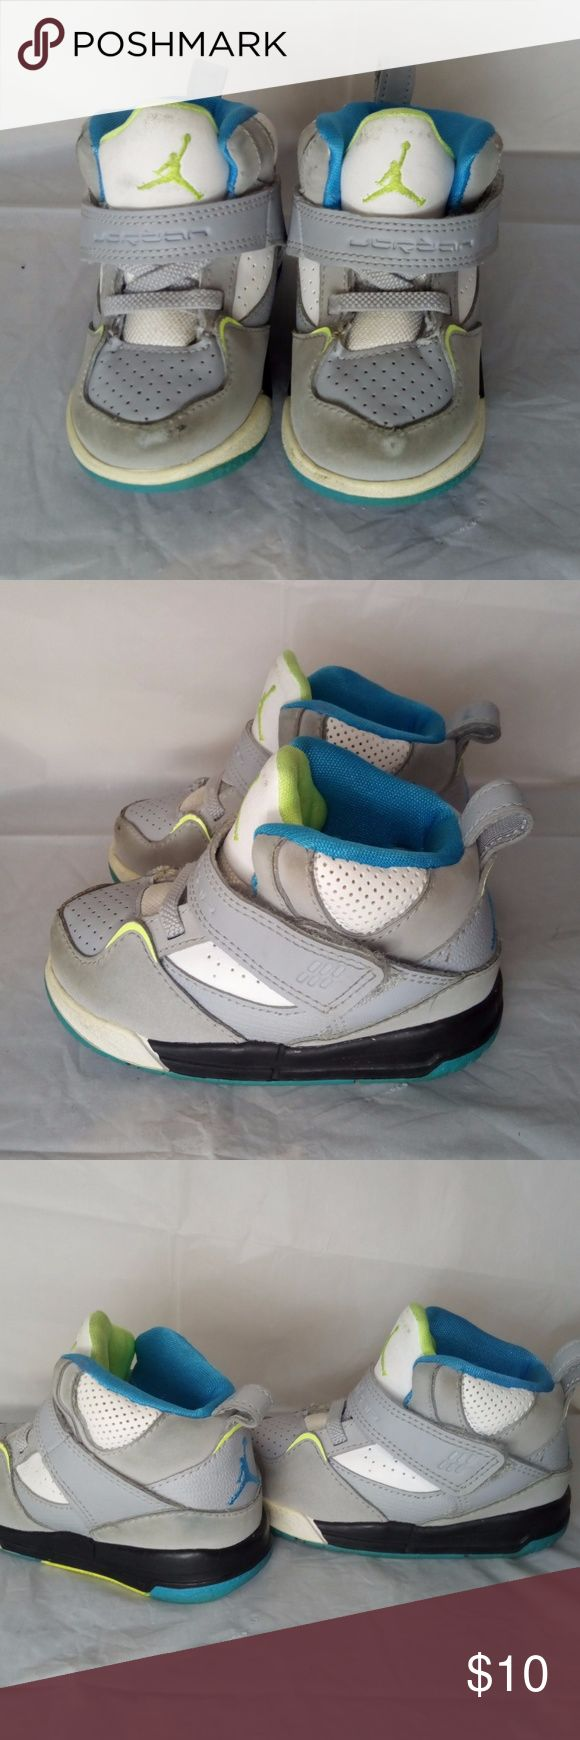 Baby Toddler Jordan high top shoes size 5c Boys' toddler Jordan high top shoes gray and white size 5c Jordan Shoes Baby & Walker